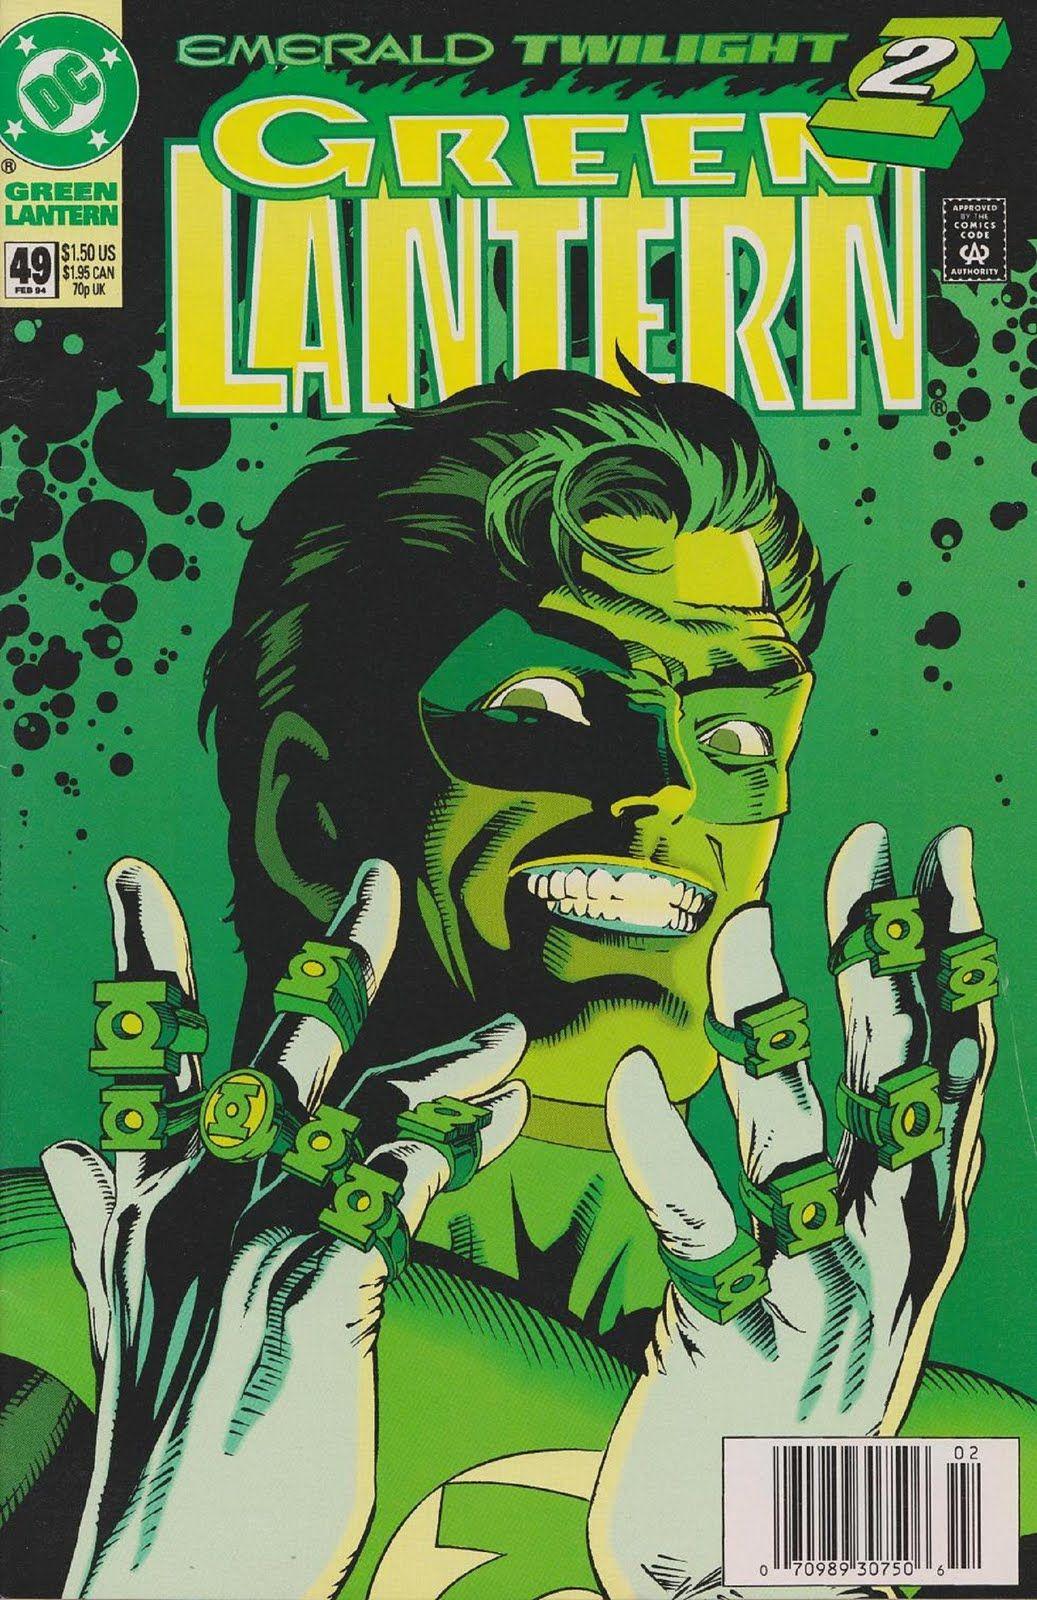 green lantern parallax cover - Bing images   Green lantern, Cover ...